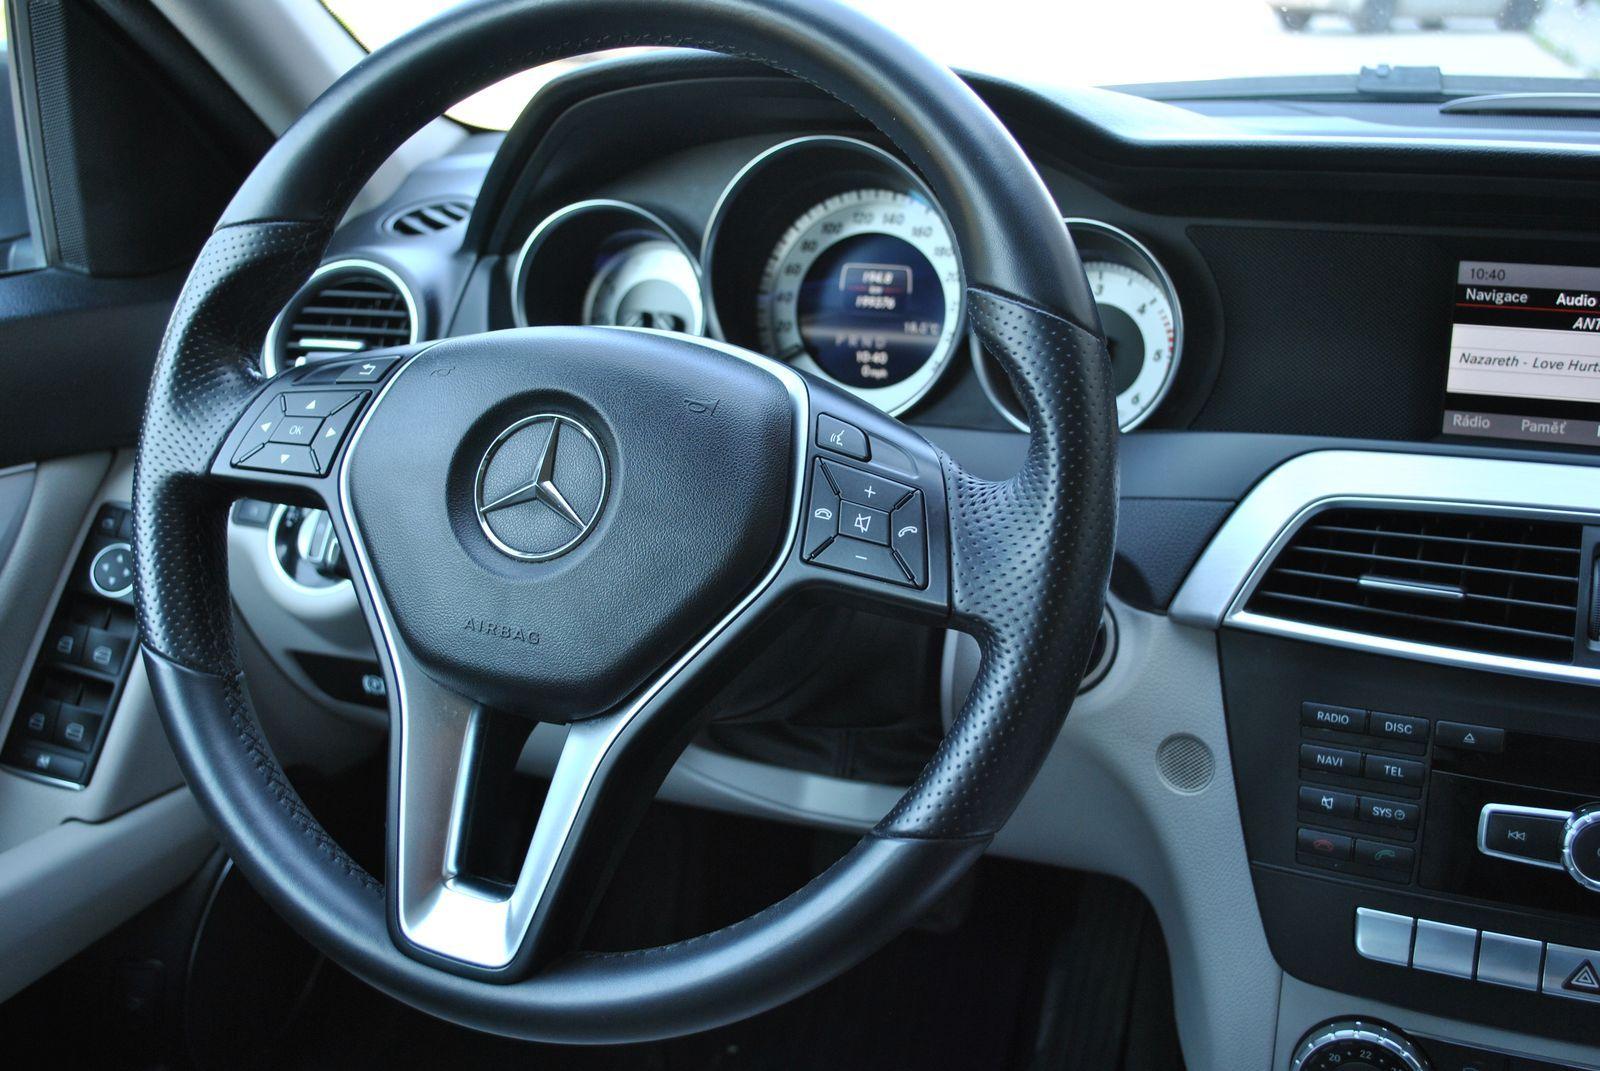 Mercedes triedy C W204